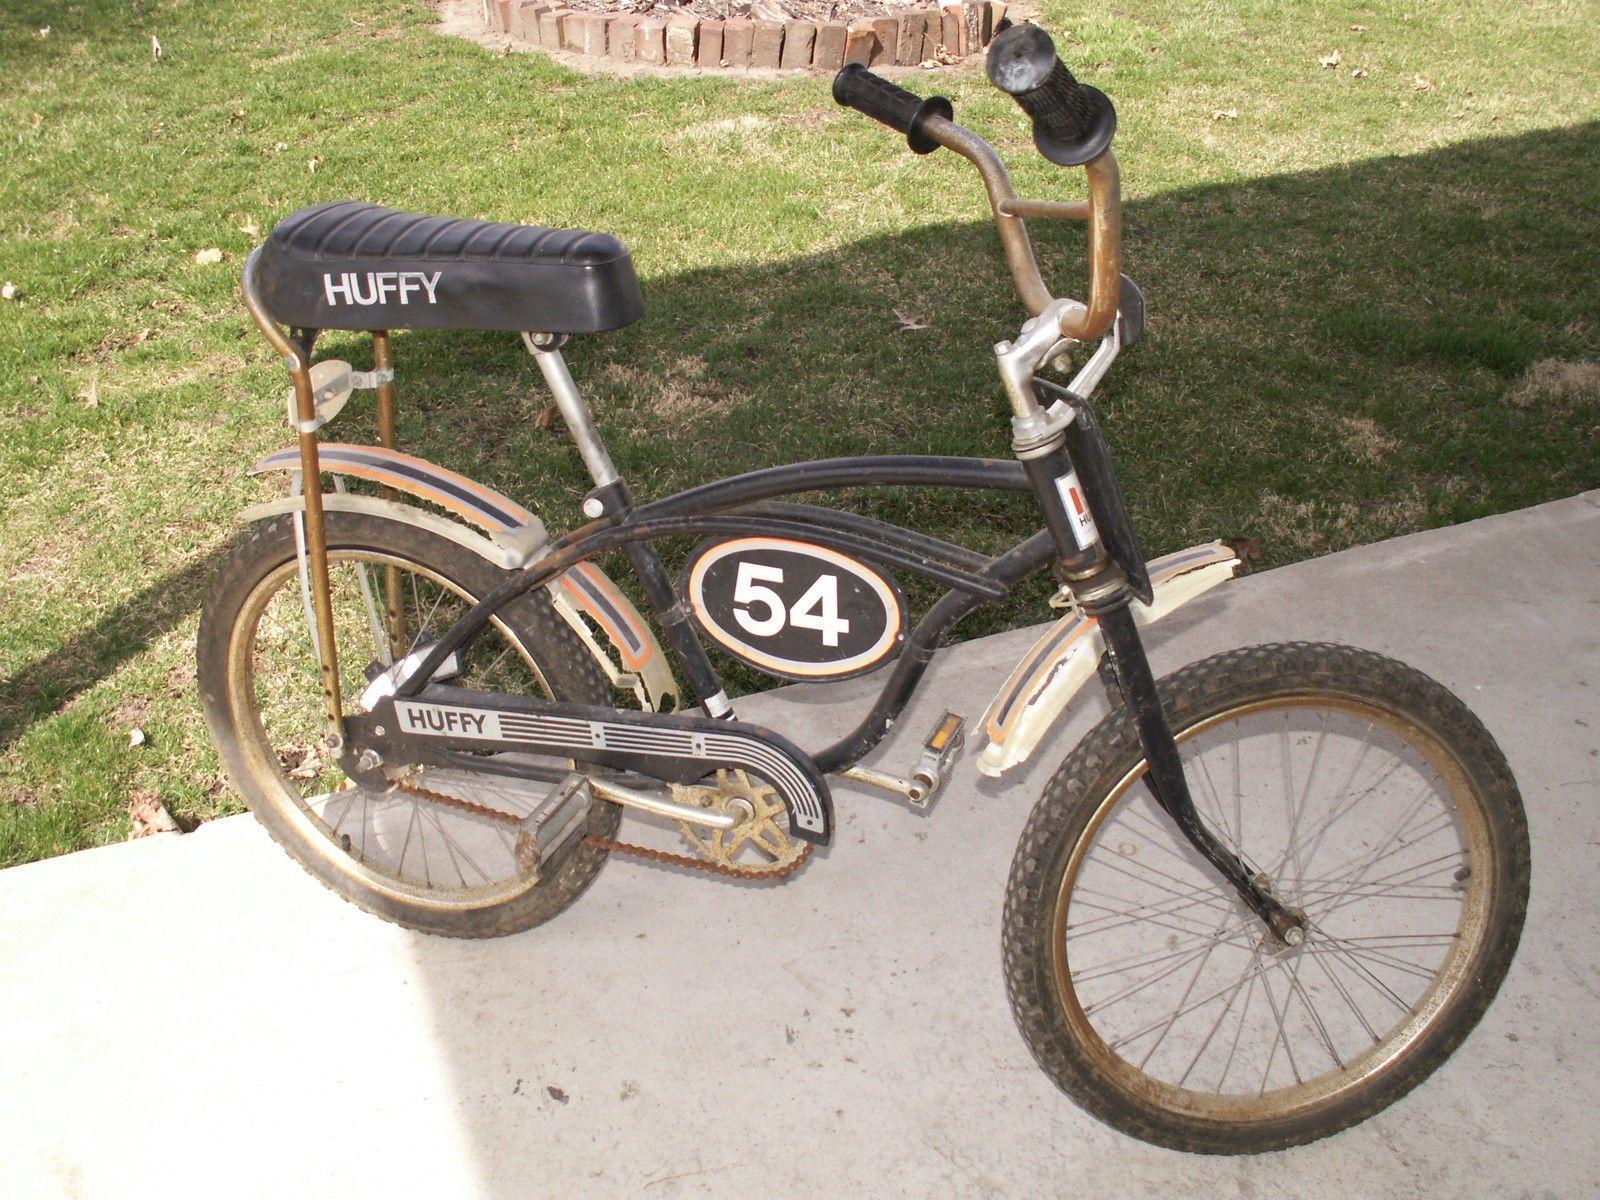 Vintage 1970' Huffy Thunder Road 54 Bicycle Bike Bmx